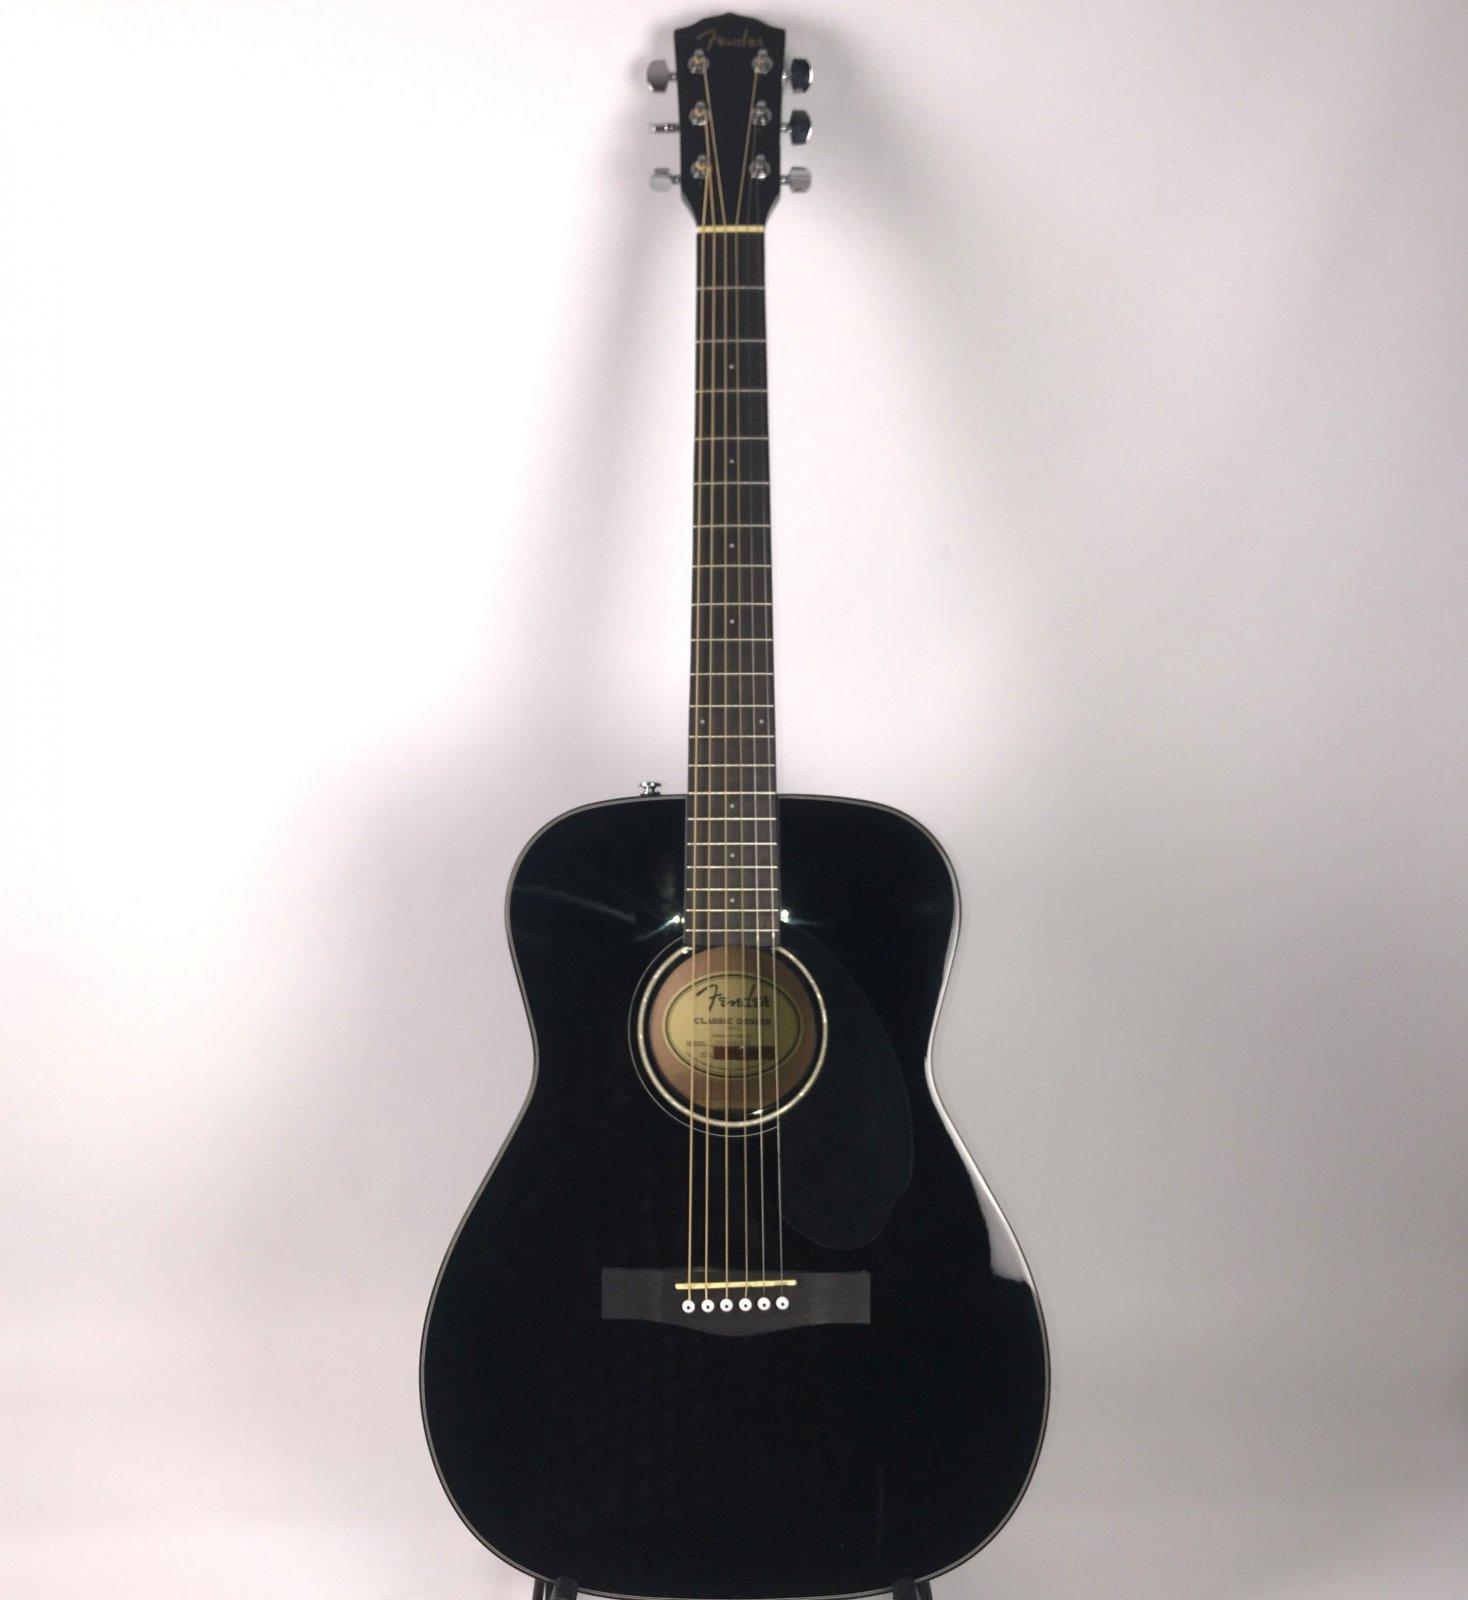 Fender CC-60S Acoustic Guitar, Black (USED)